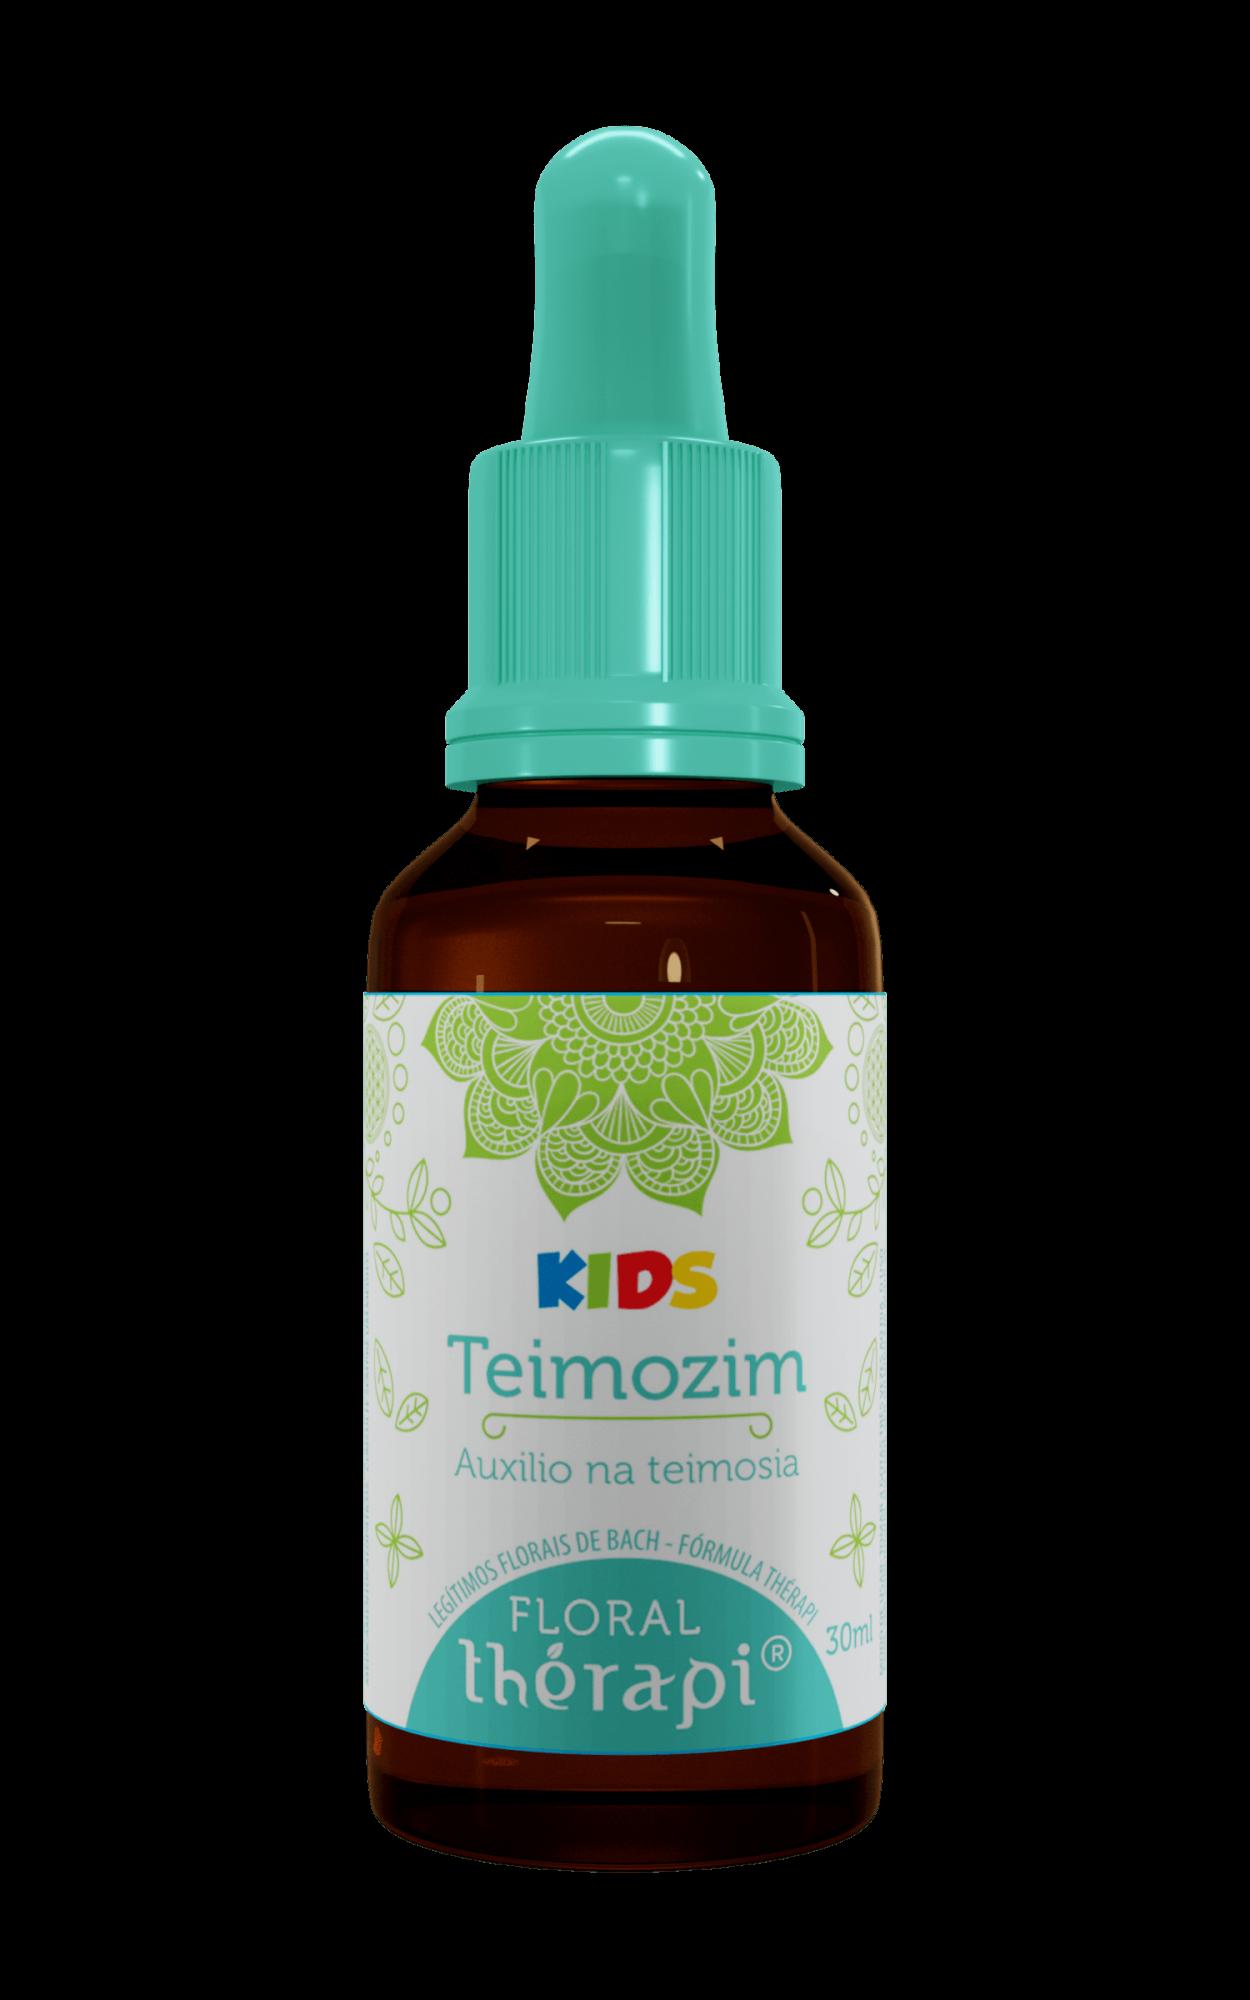 Floral Kids Teimozim - Florais Thérapi  - Loja Online | Manipule - Farmácia de Manipulação